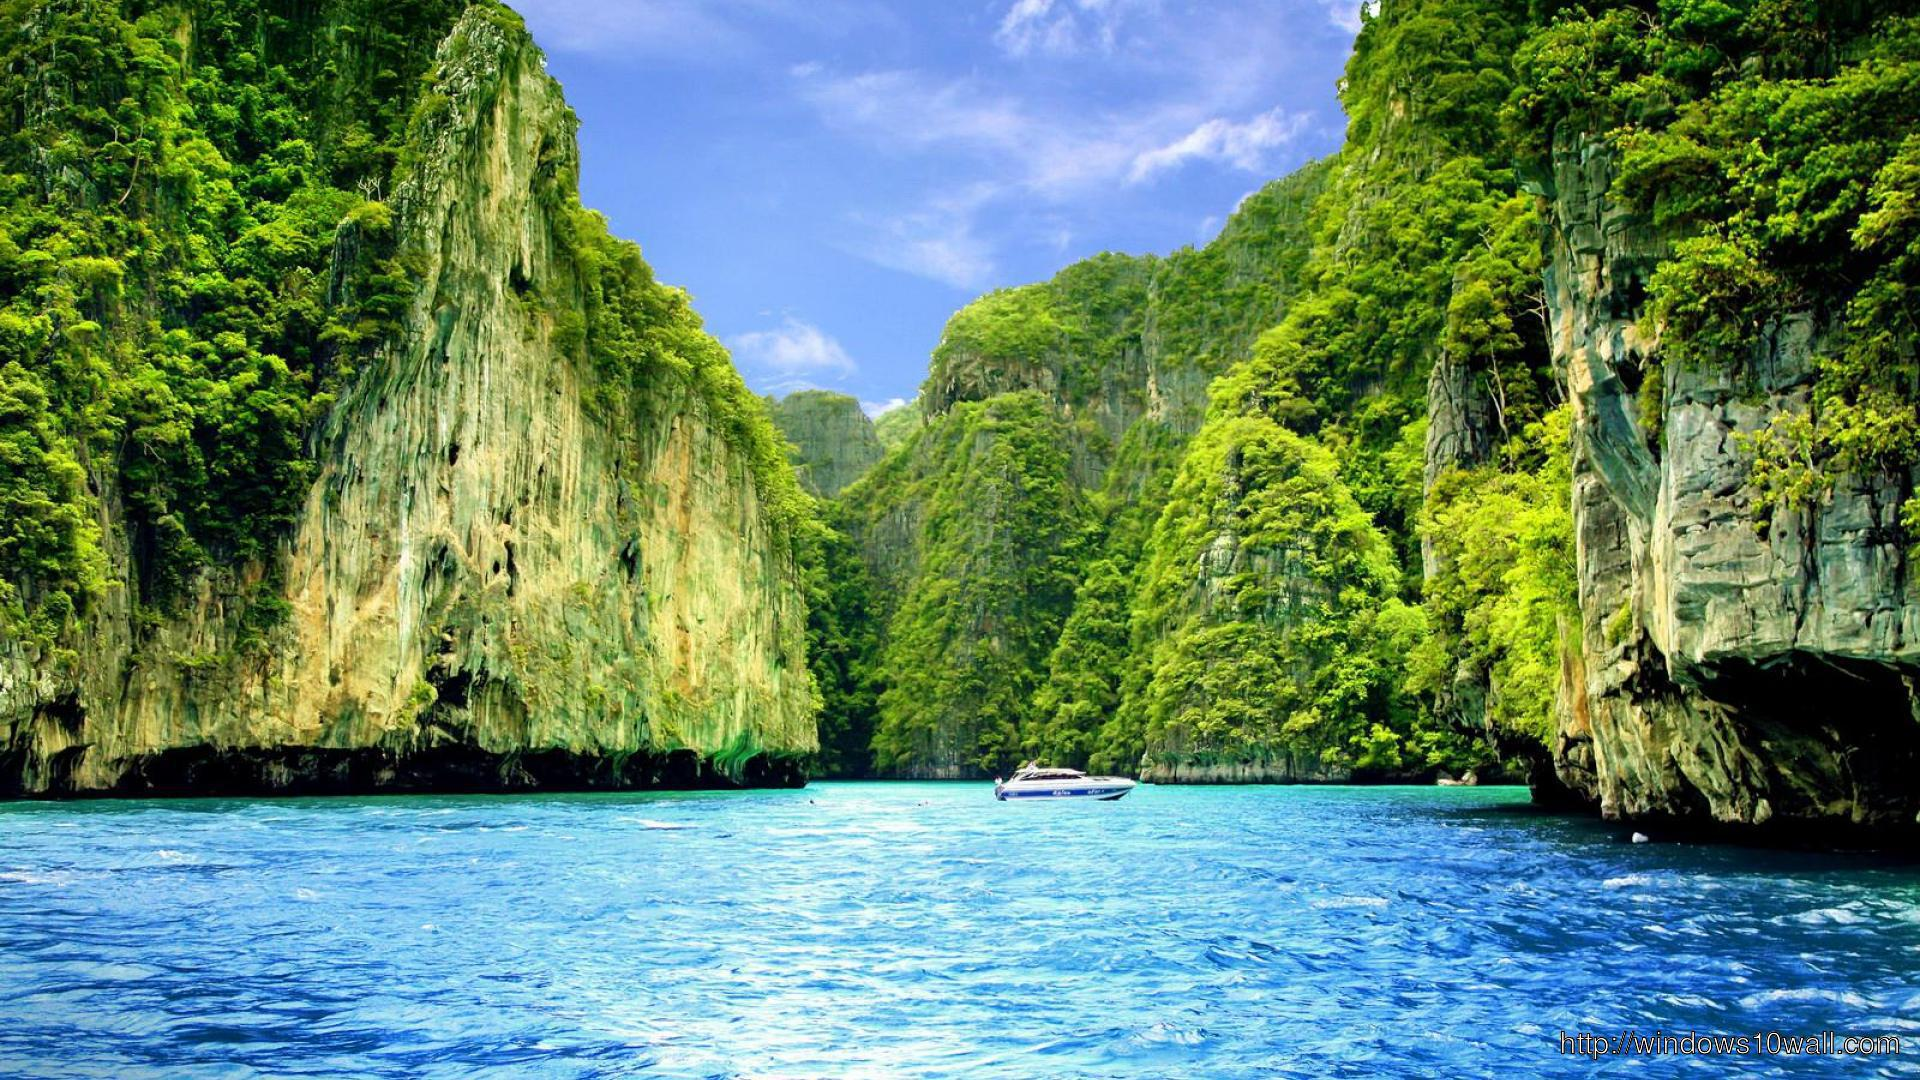 Beautiful Islands Wallpaper Windows 10 Wallpapers